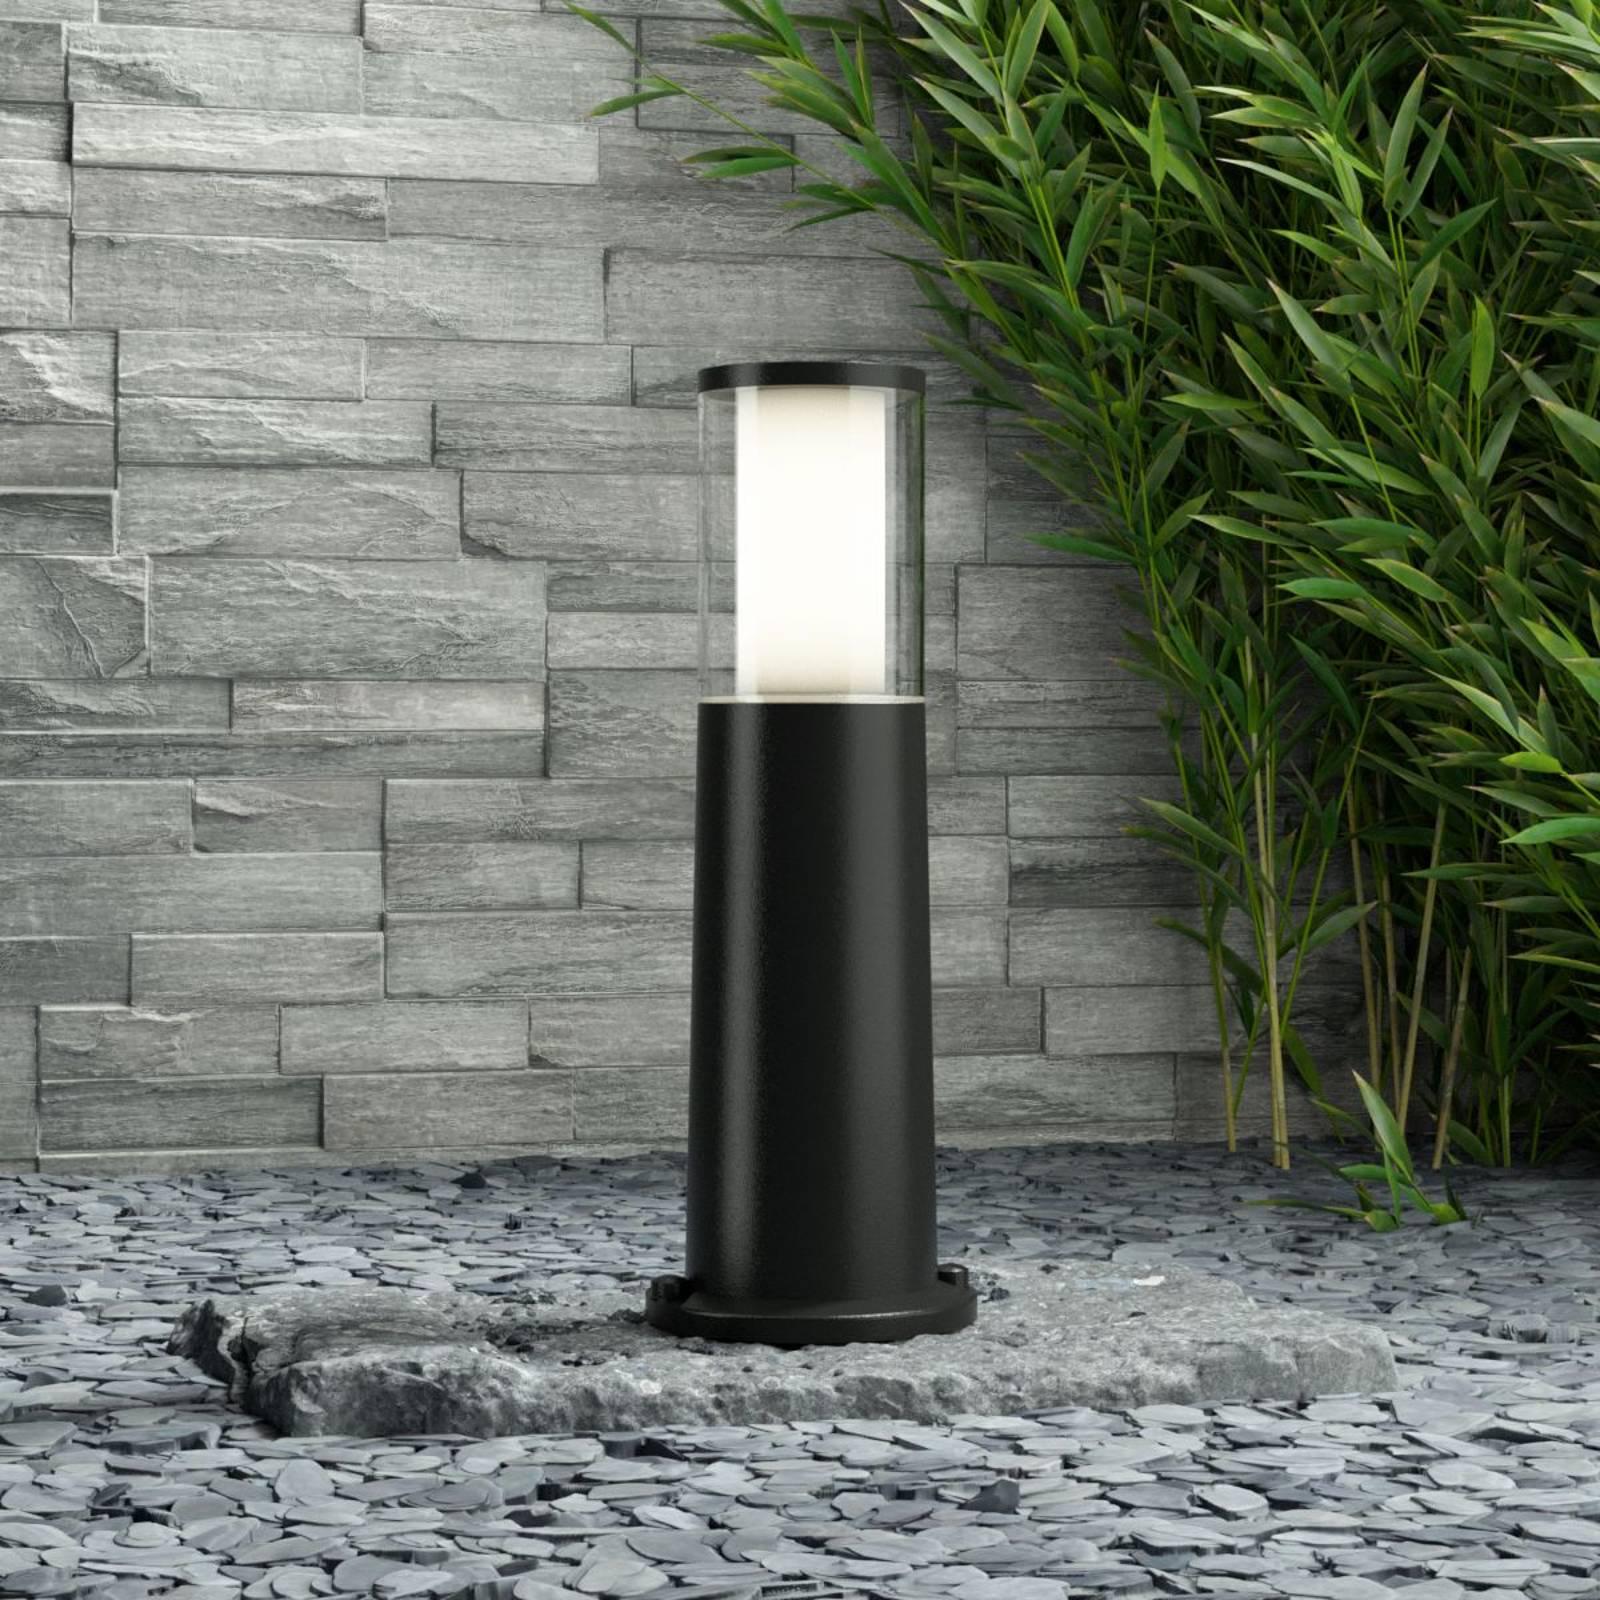 Carlo-LED-pollarivaliaisn, musta 3,5W CCT 40 cm